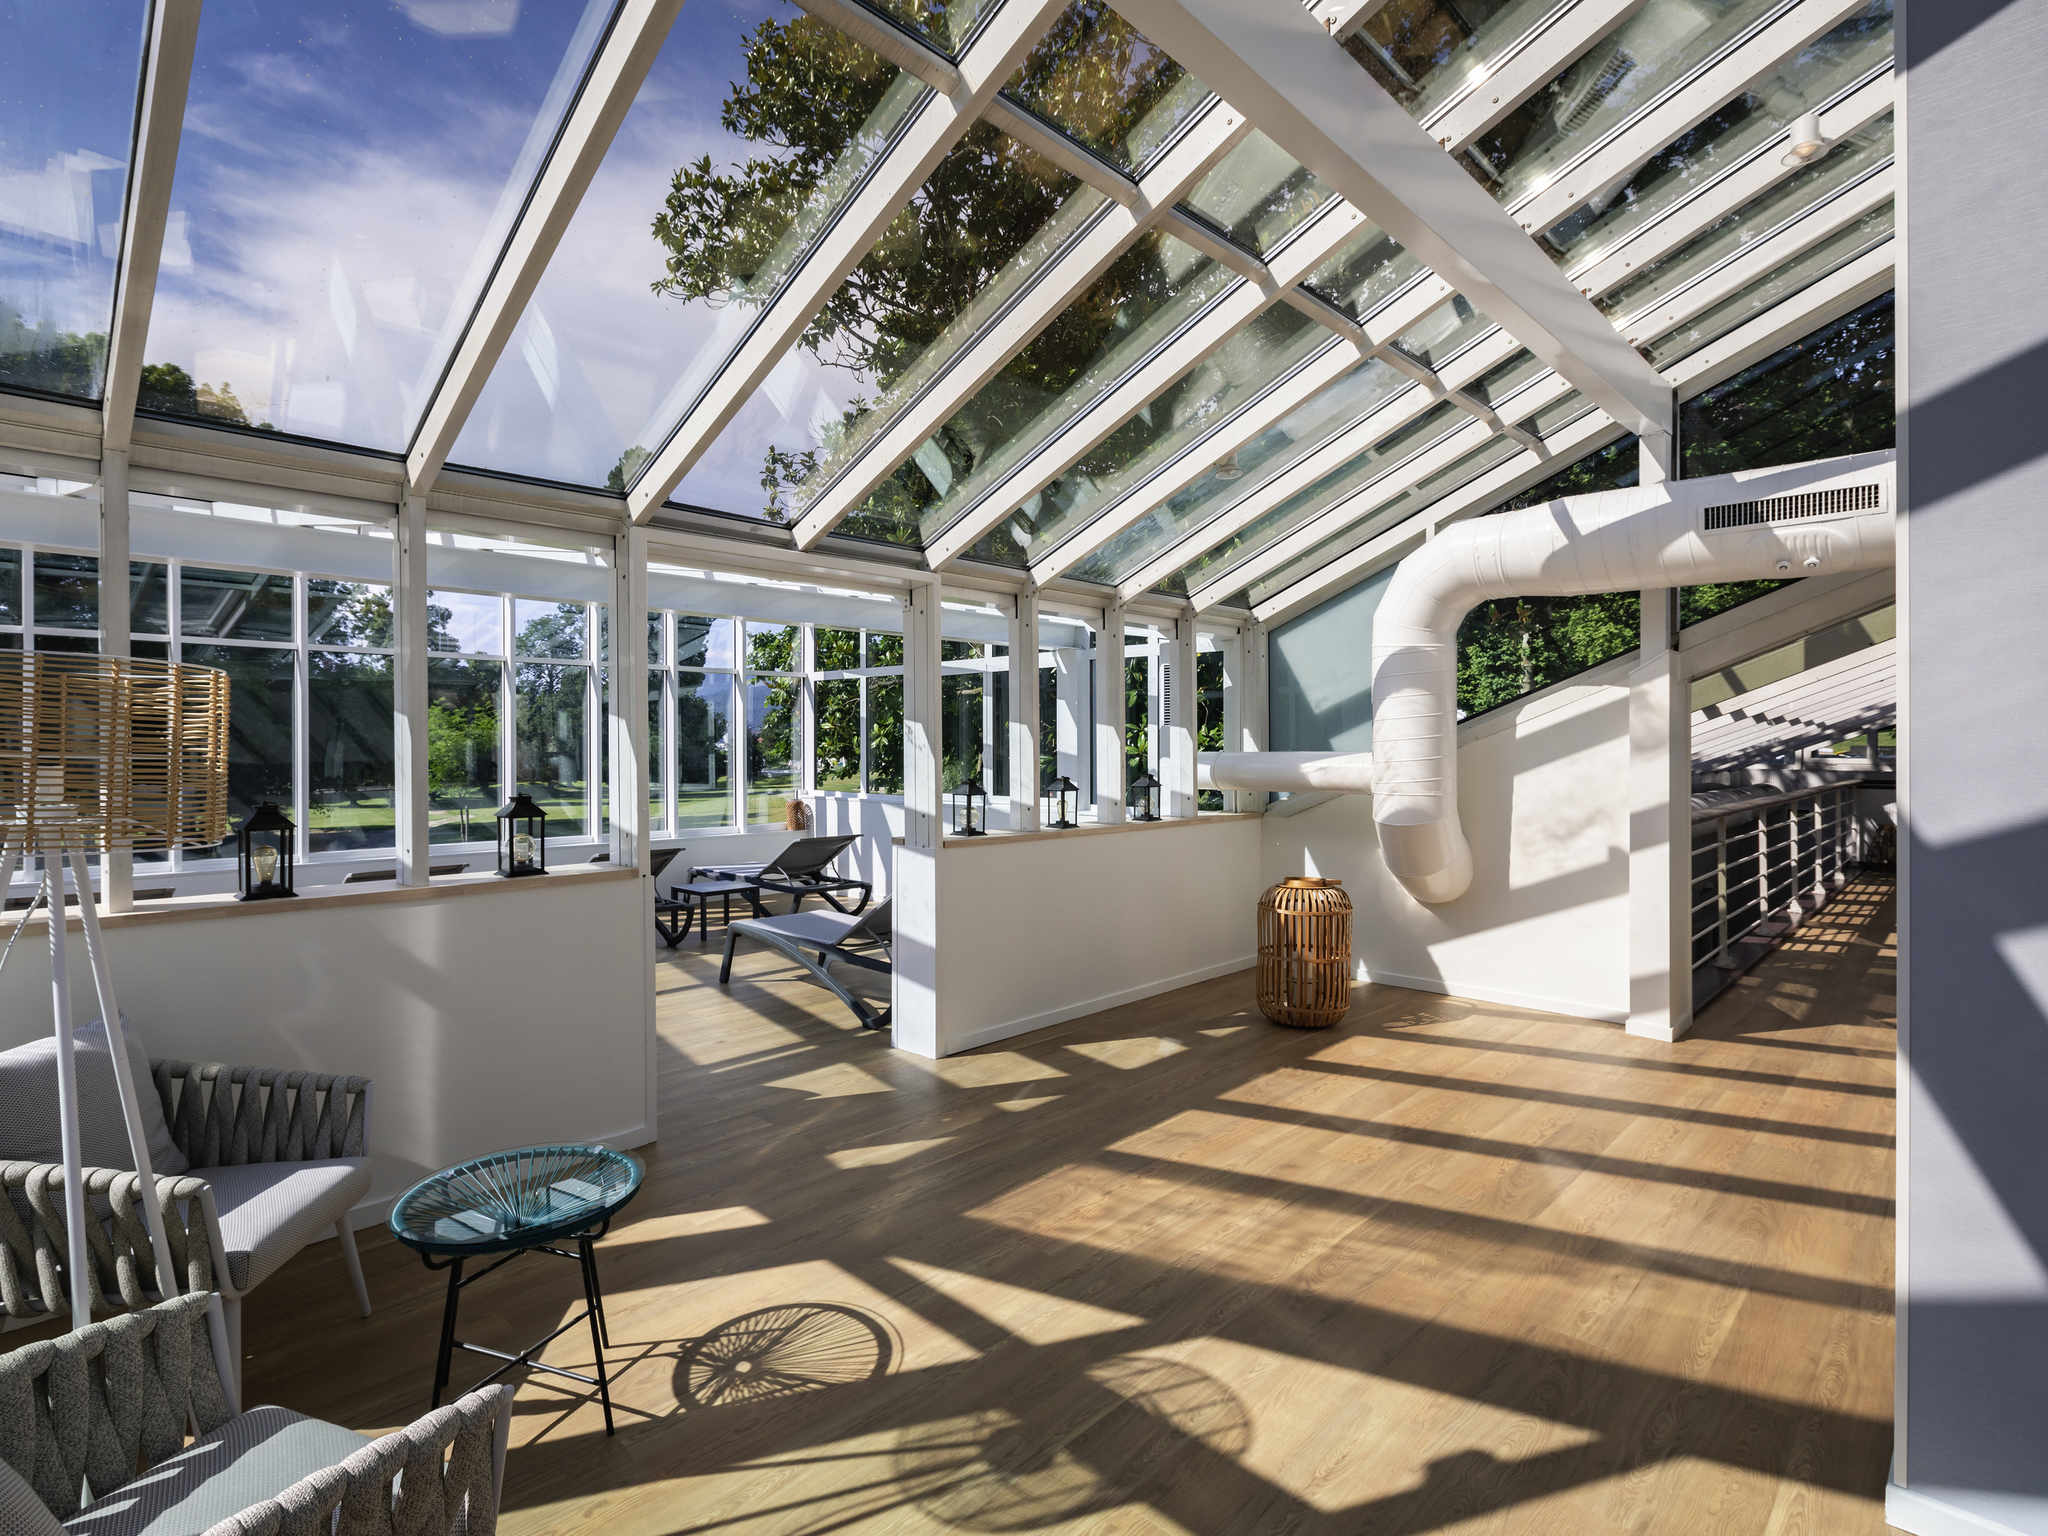 Bon ... Hotel   Mercure Hotel U0026 Spa Aix Les Bains Domaine Marlioz ...